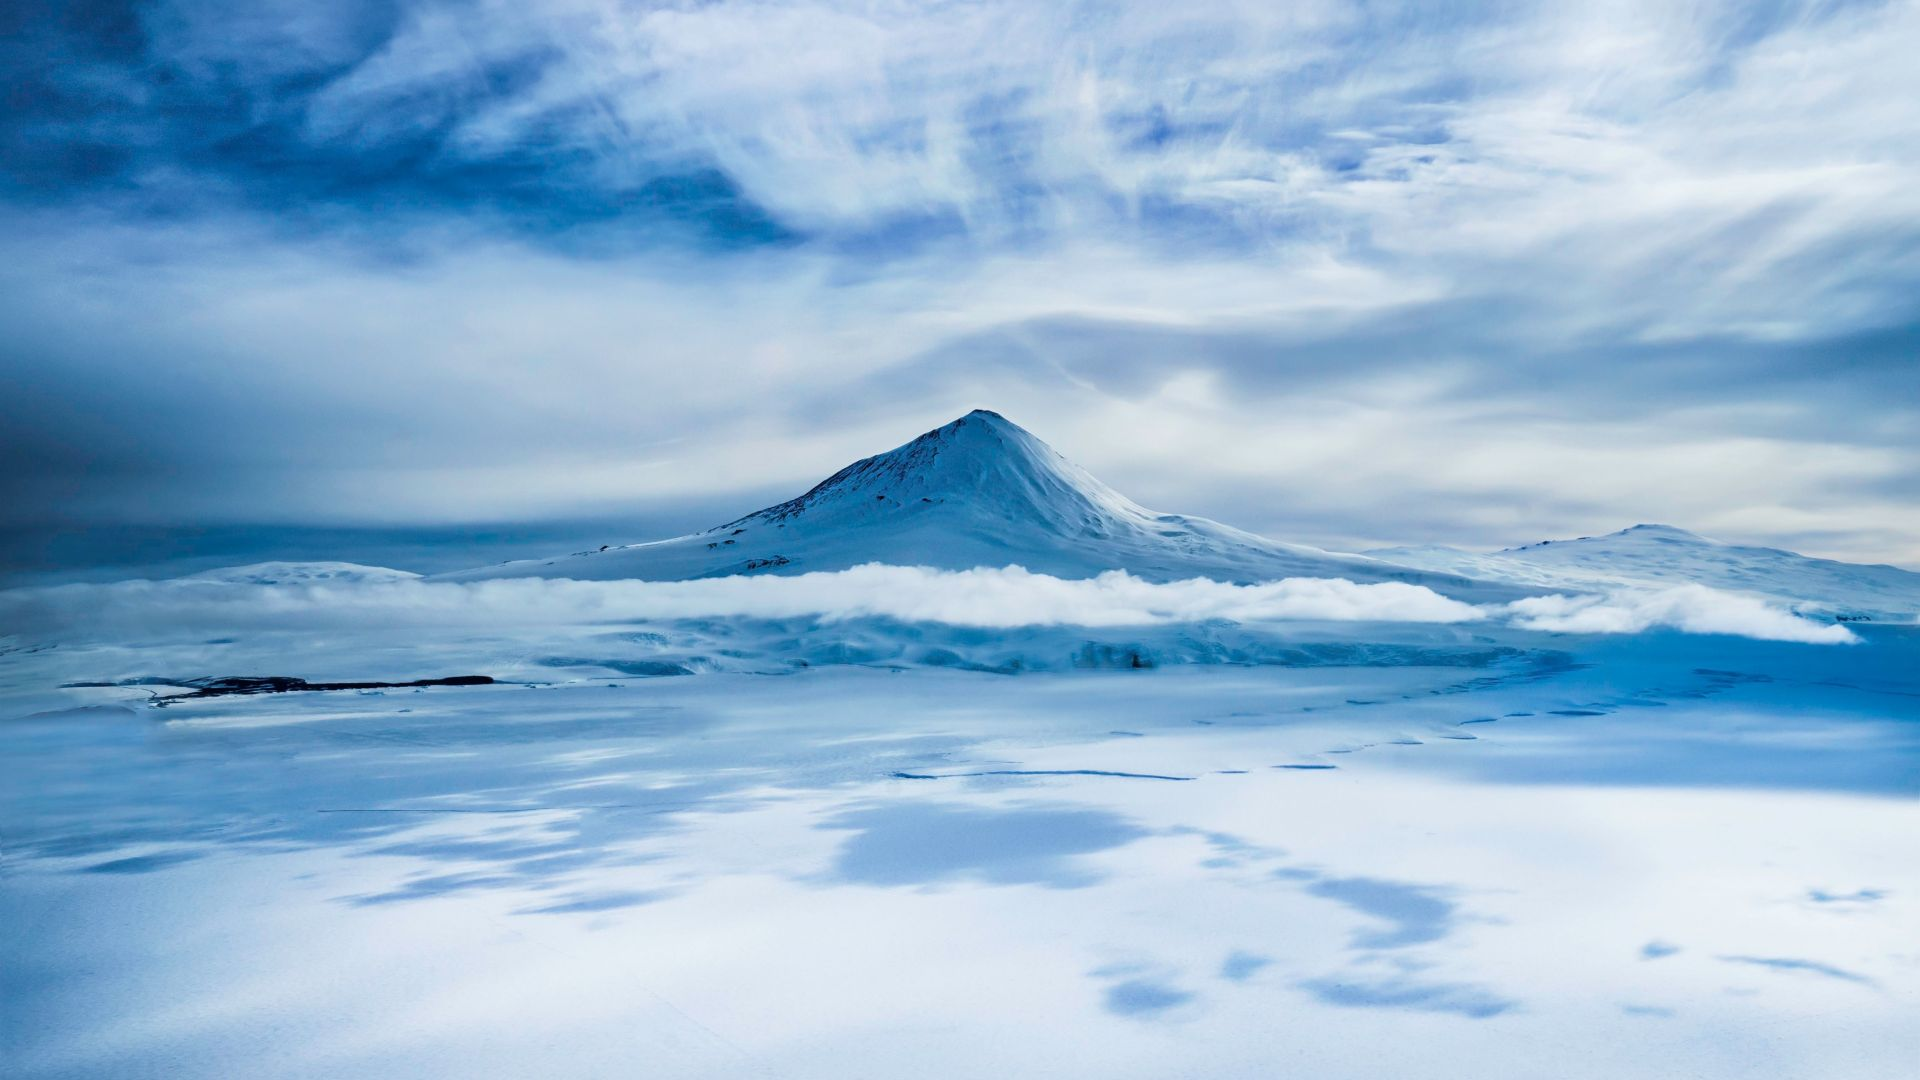 wallpaper erebus antarctica volcano snow winter 5k